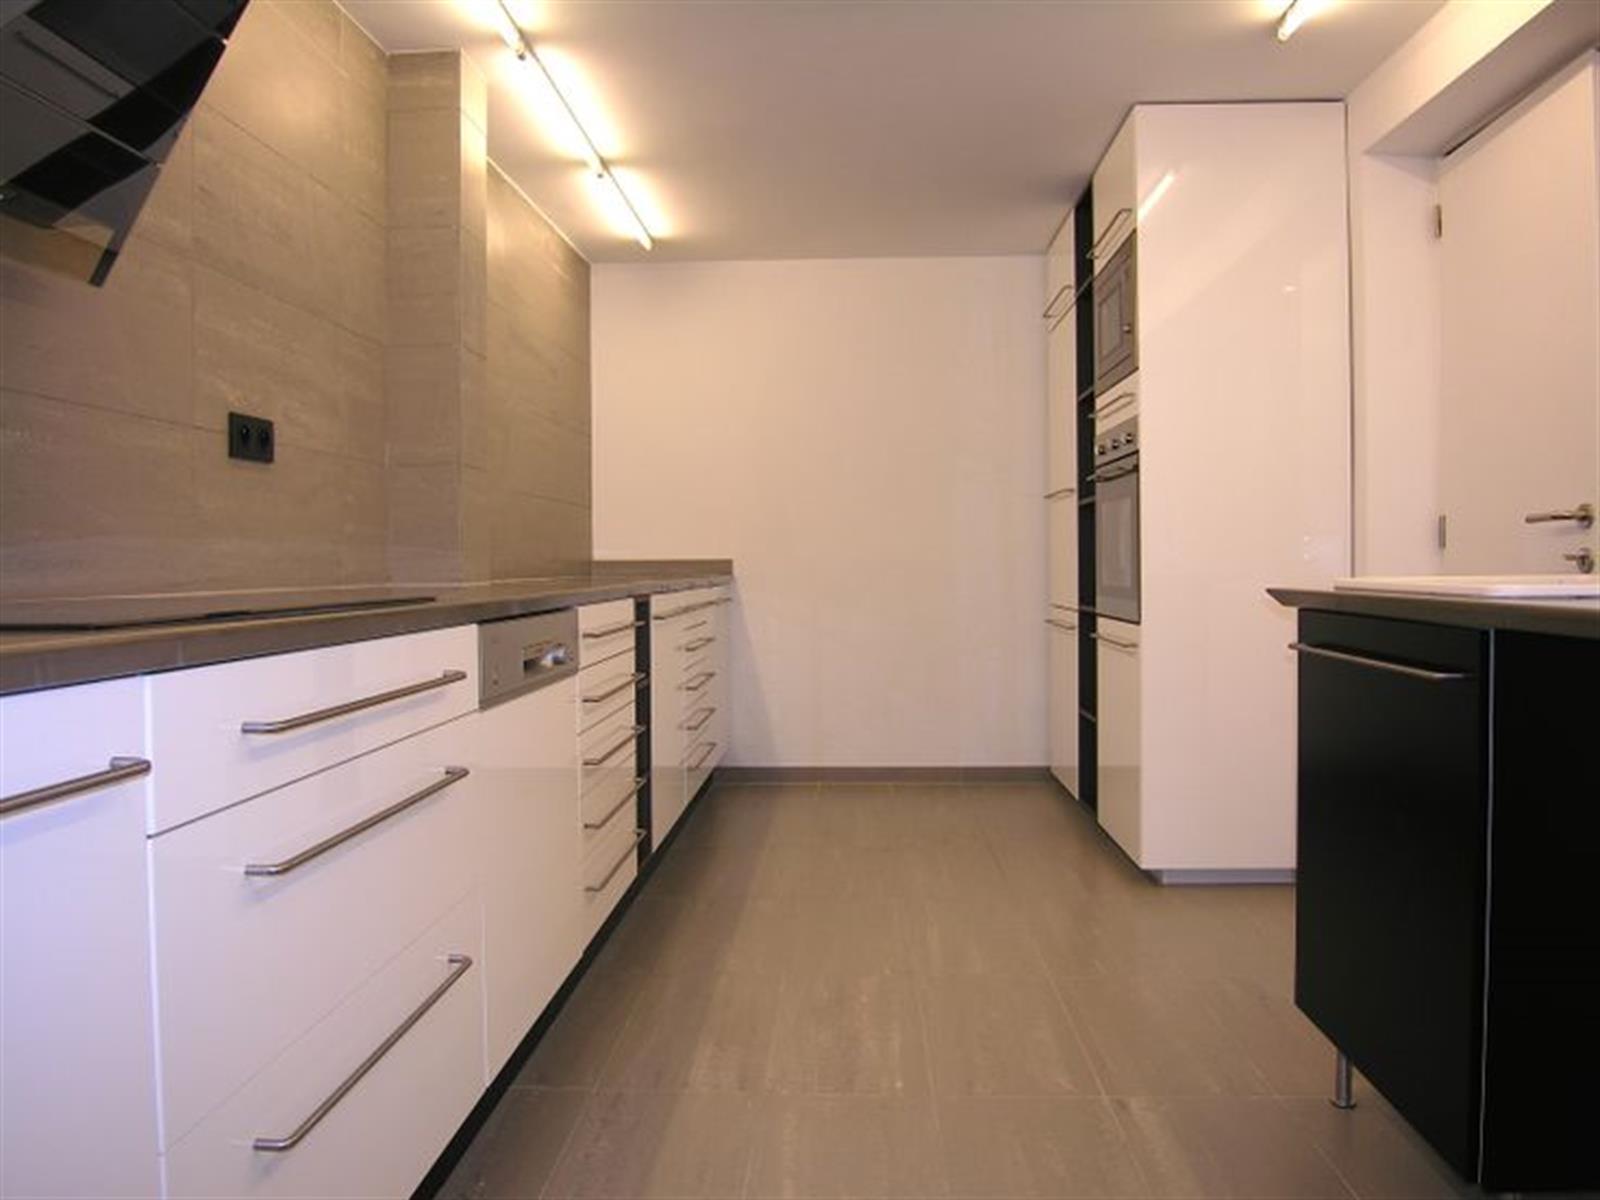 House - Etterbeek - #4365368-8